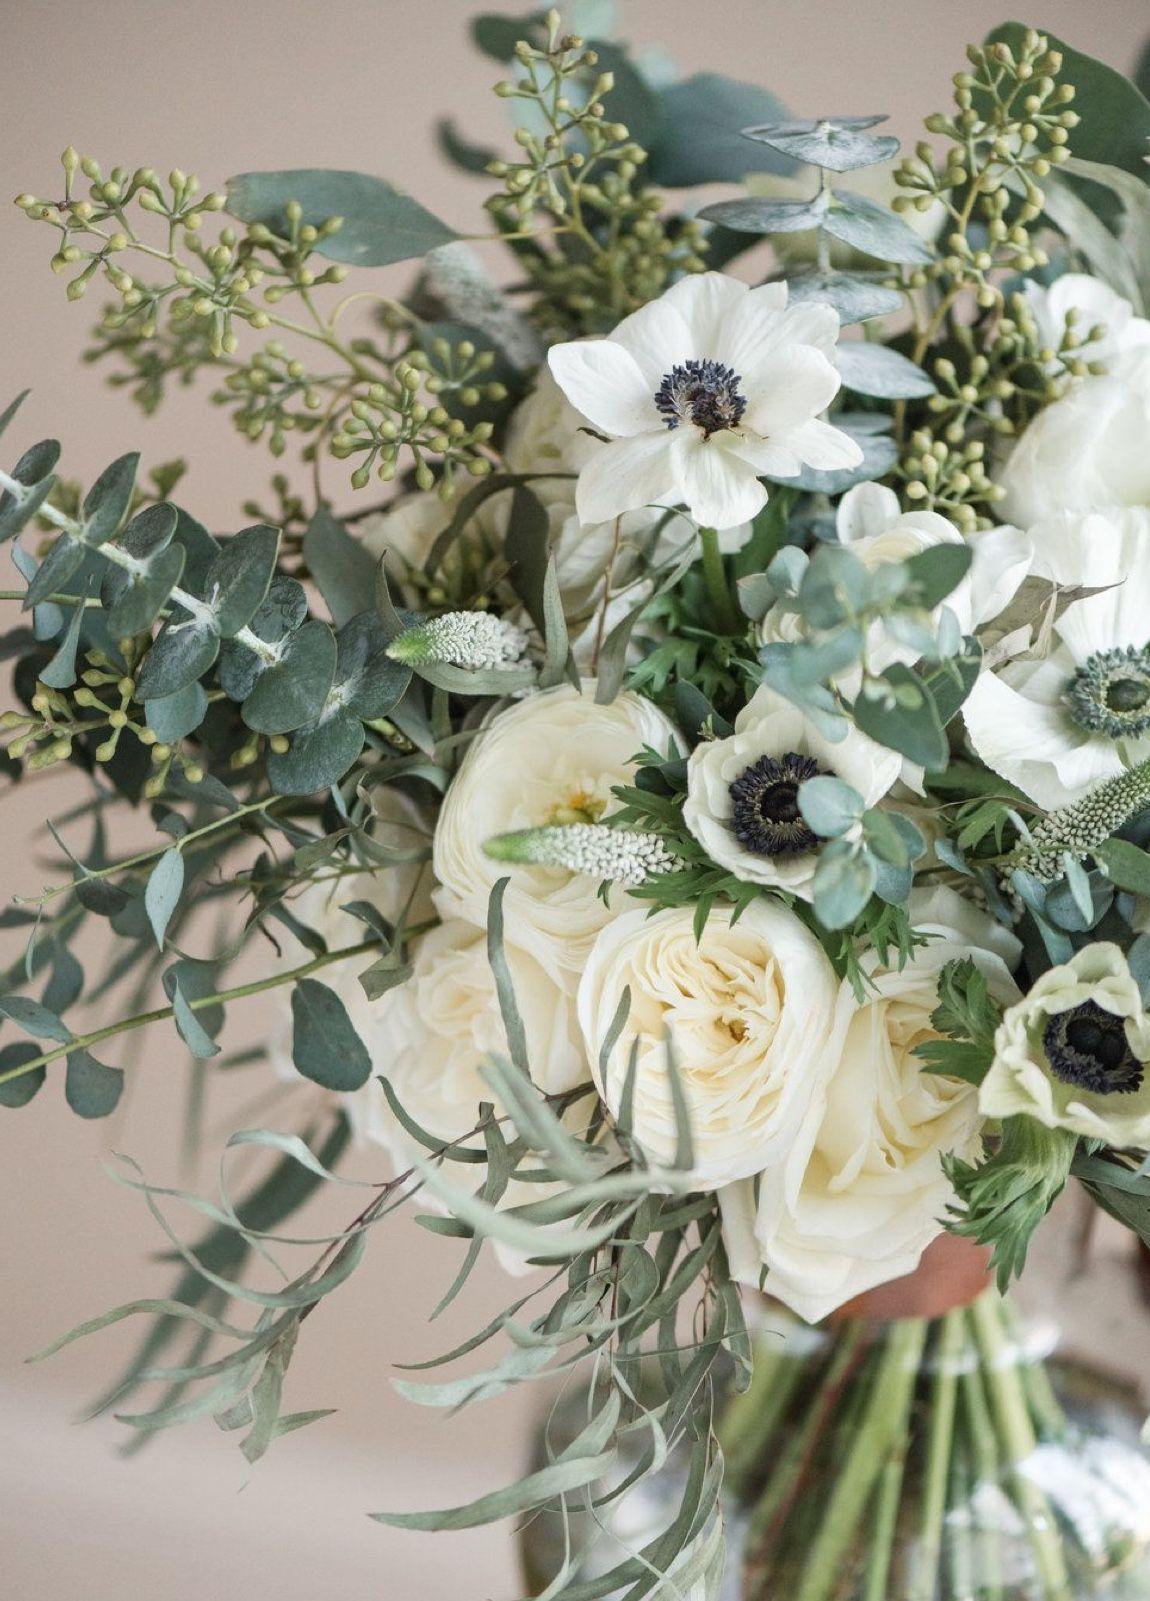 Flower Arrangement With Anemones Seeded Eucalyptus Feather Eucalyptus Gunni Eucalypt Wedding Flower Guide White Wedding Bouquets Wedding Flower Arrangements